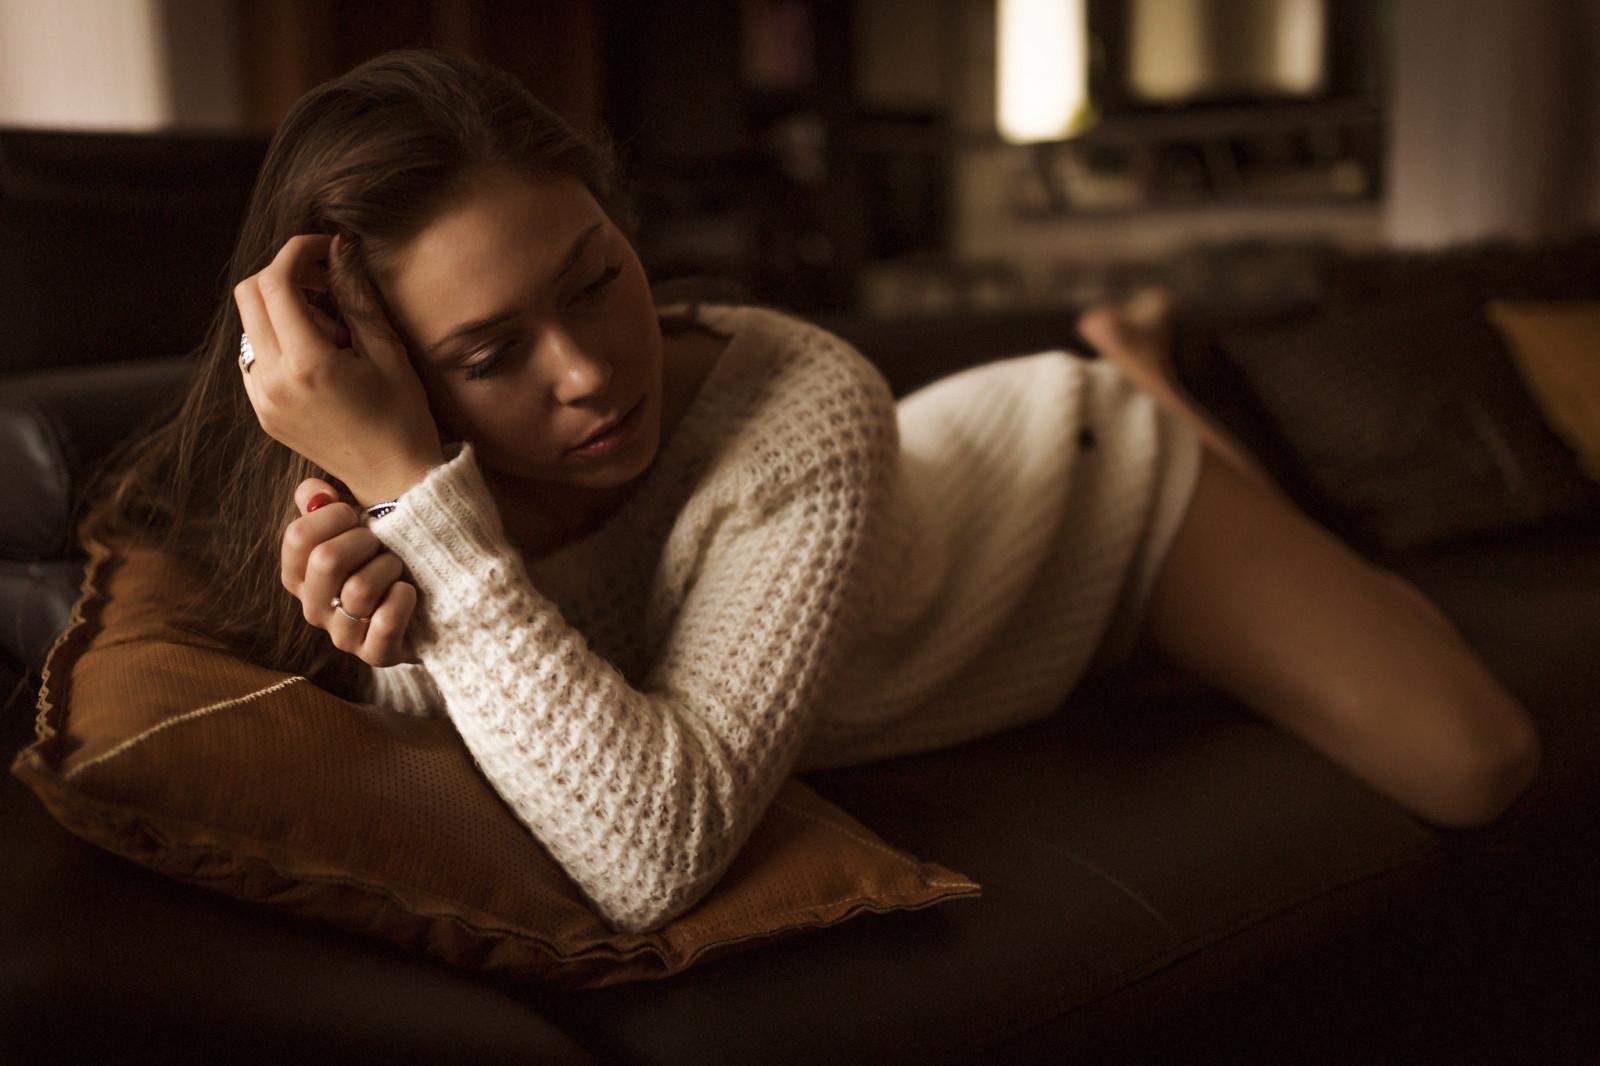 women, Model, Legs, Sitting, Christmas, Sweater, Christmas